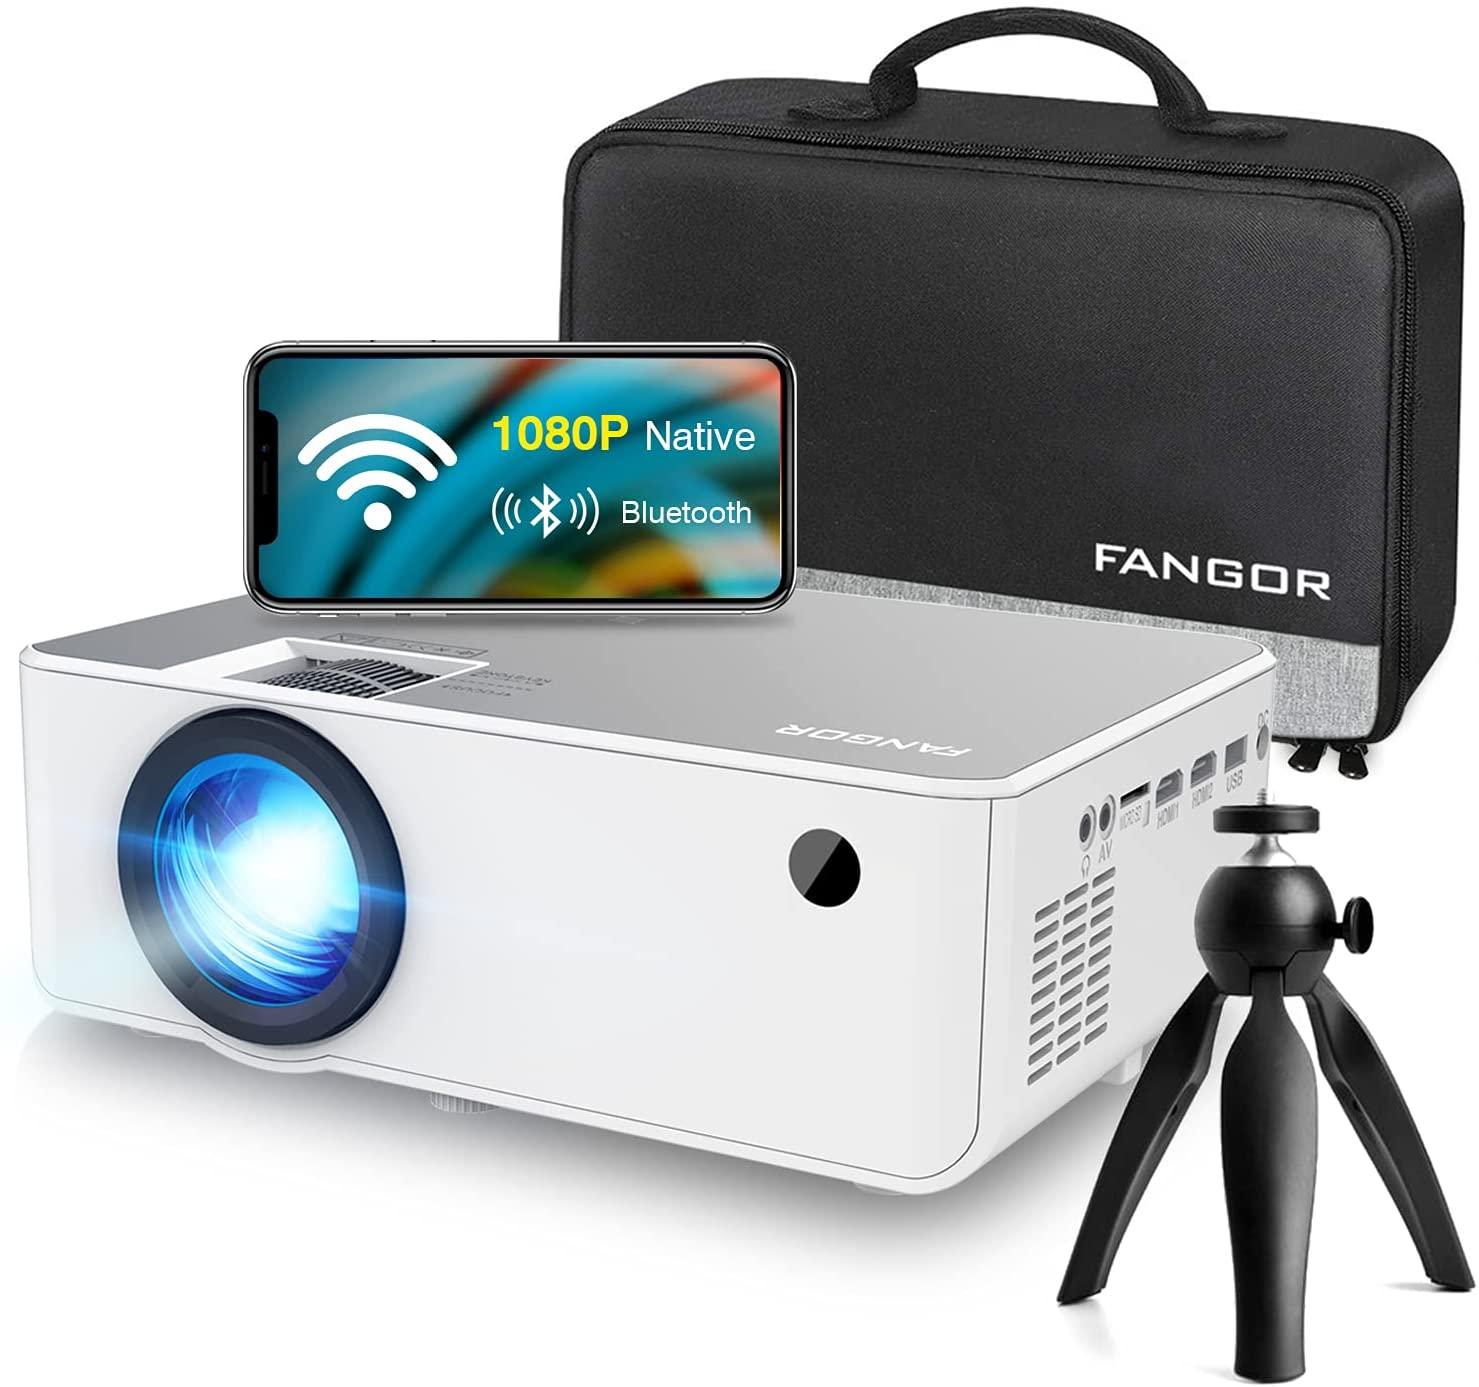 "FANGOR 230"" Portable LED HD Projector"